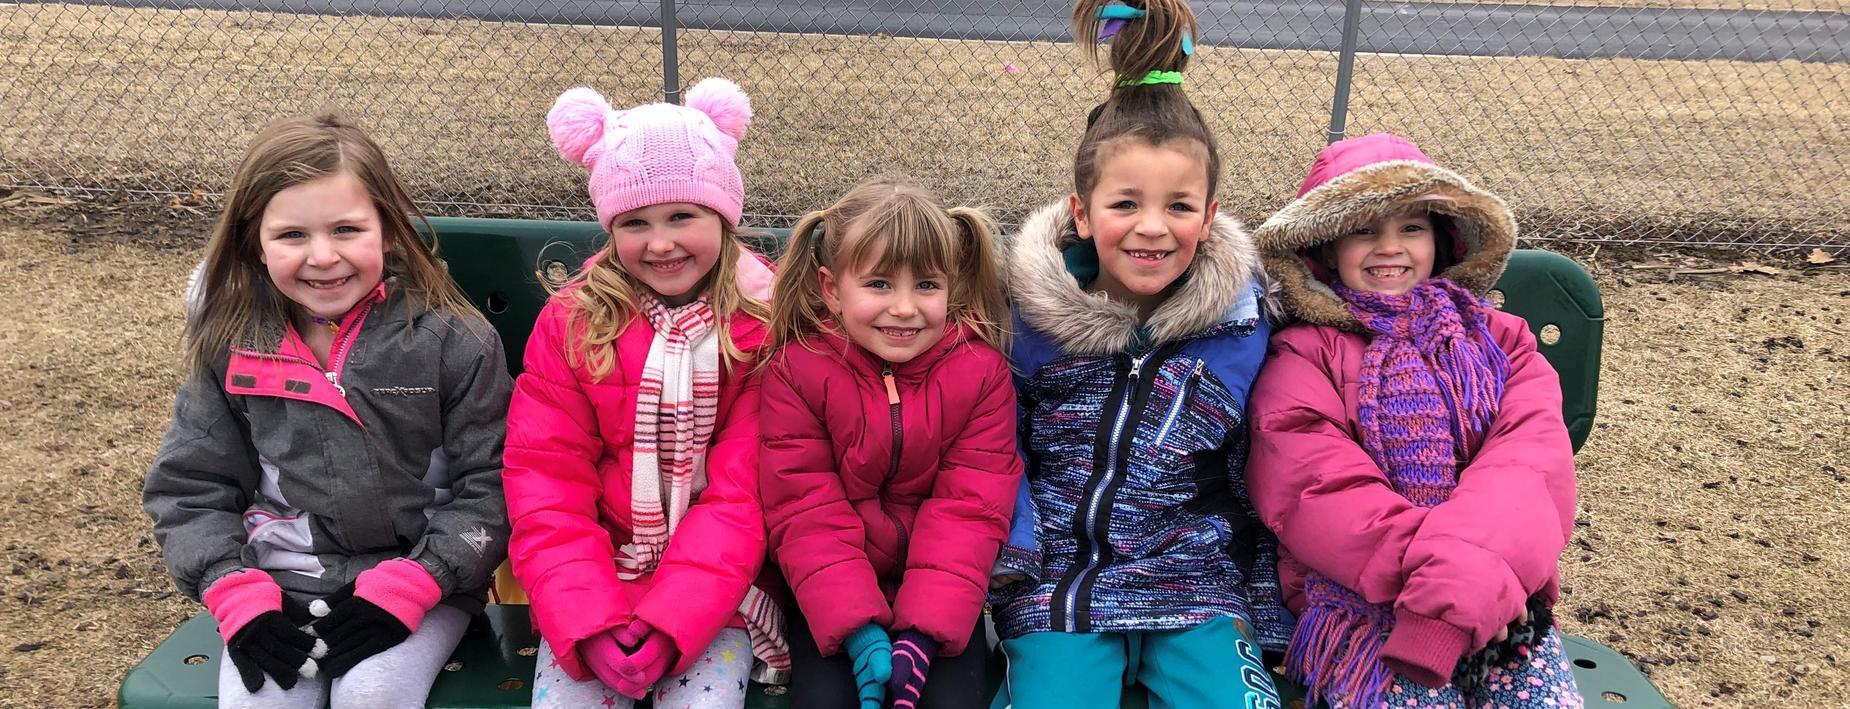 girls enjoying a winter day at the ECC